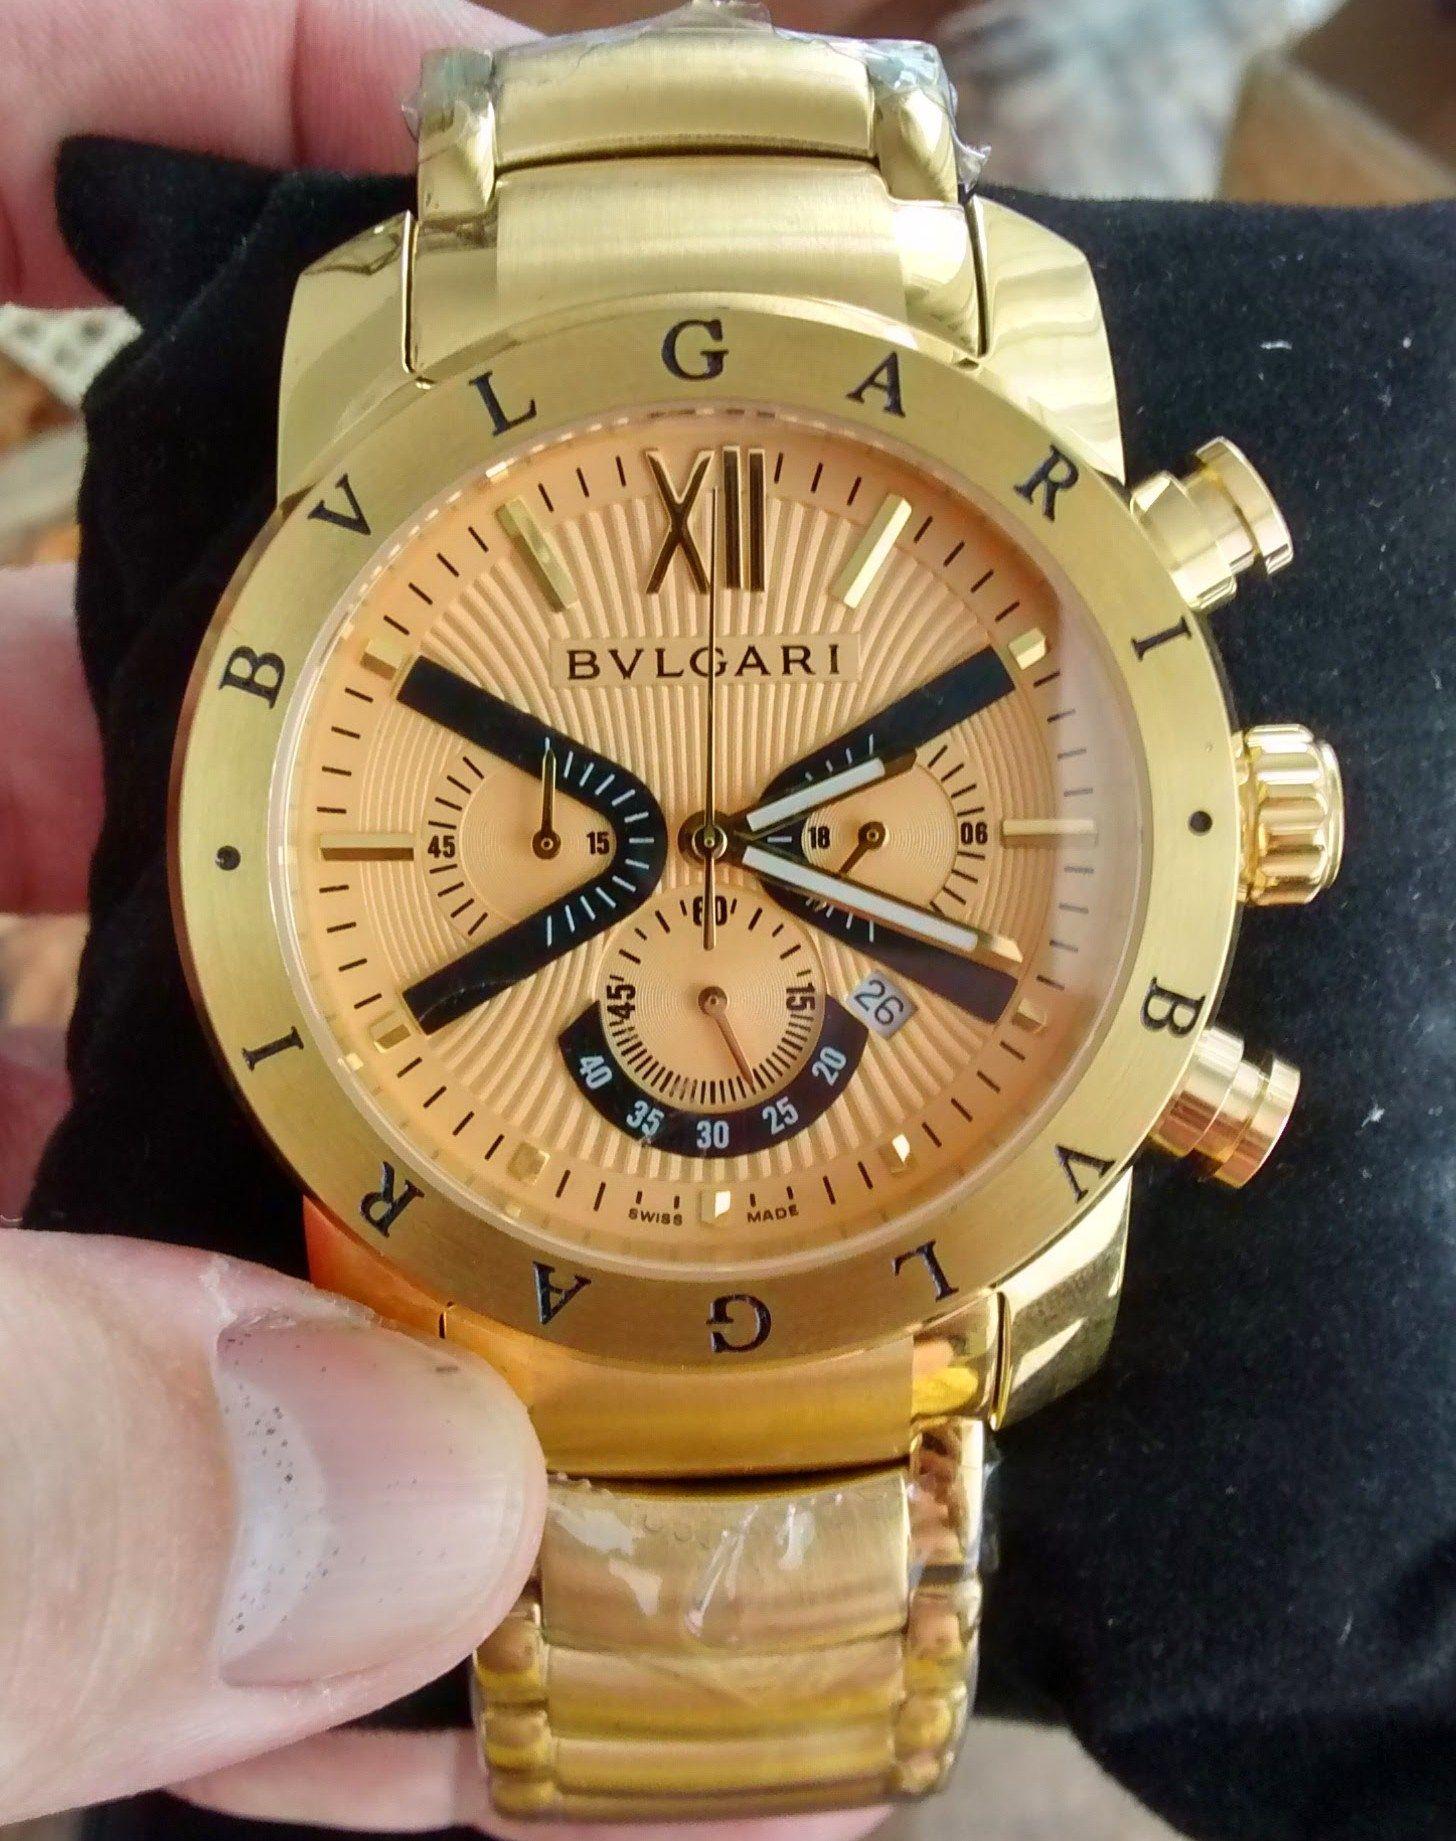 fa1ea3162f9 Lindo Relógio Bvlgari Dourado Modelo Iron Man ( Homen de Ferro ) Acesse  www.w3shopimport.com e compre o seu.  bvlgari  bvlgari ironman  relogios ...